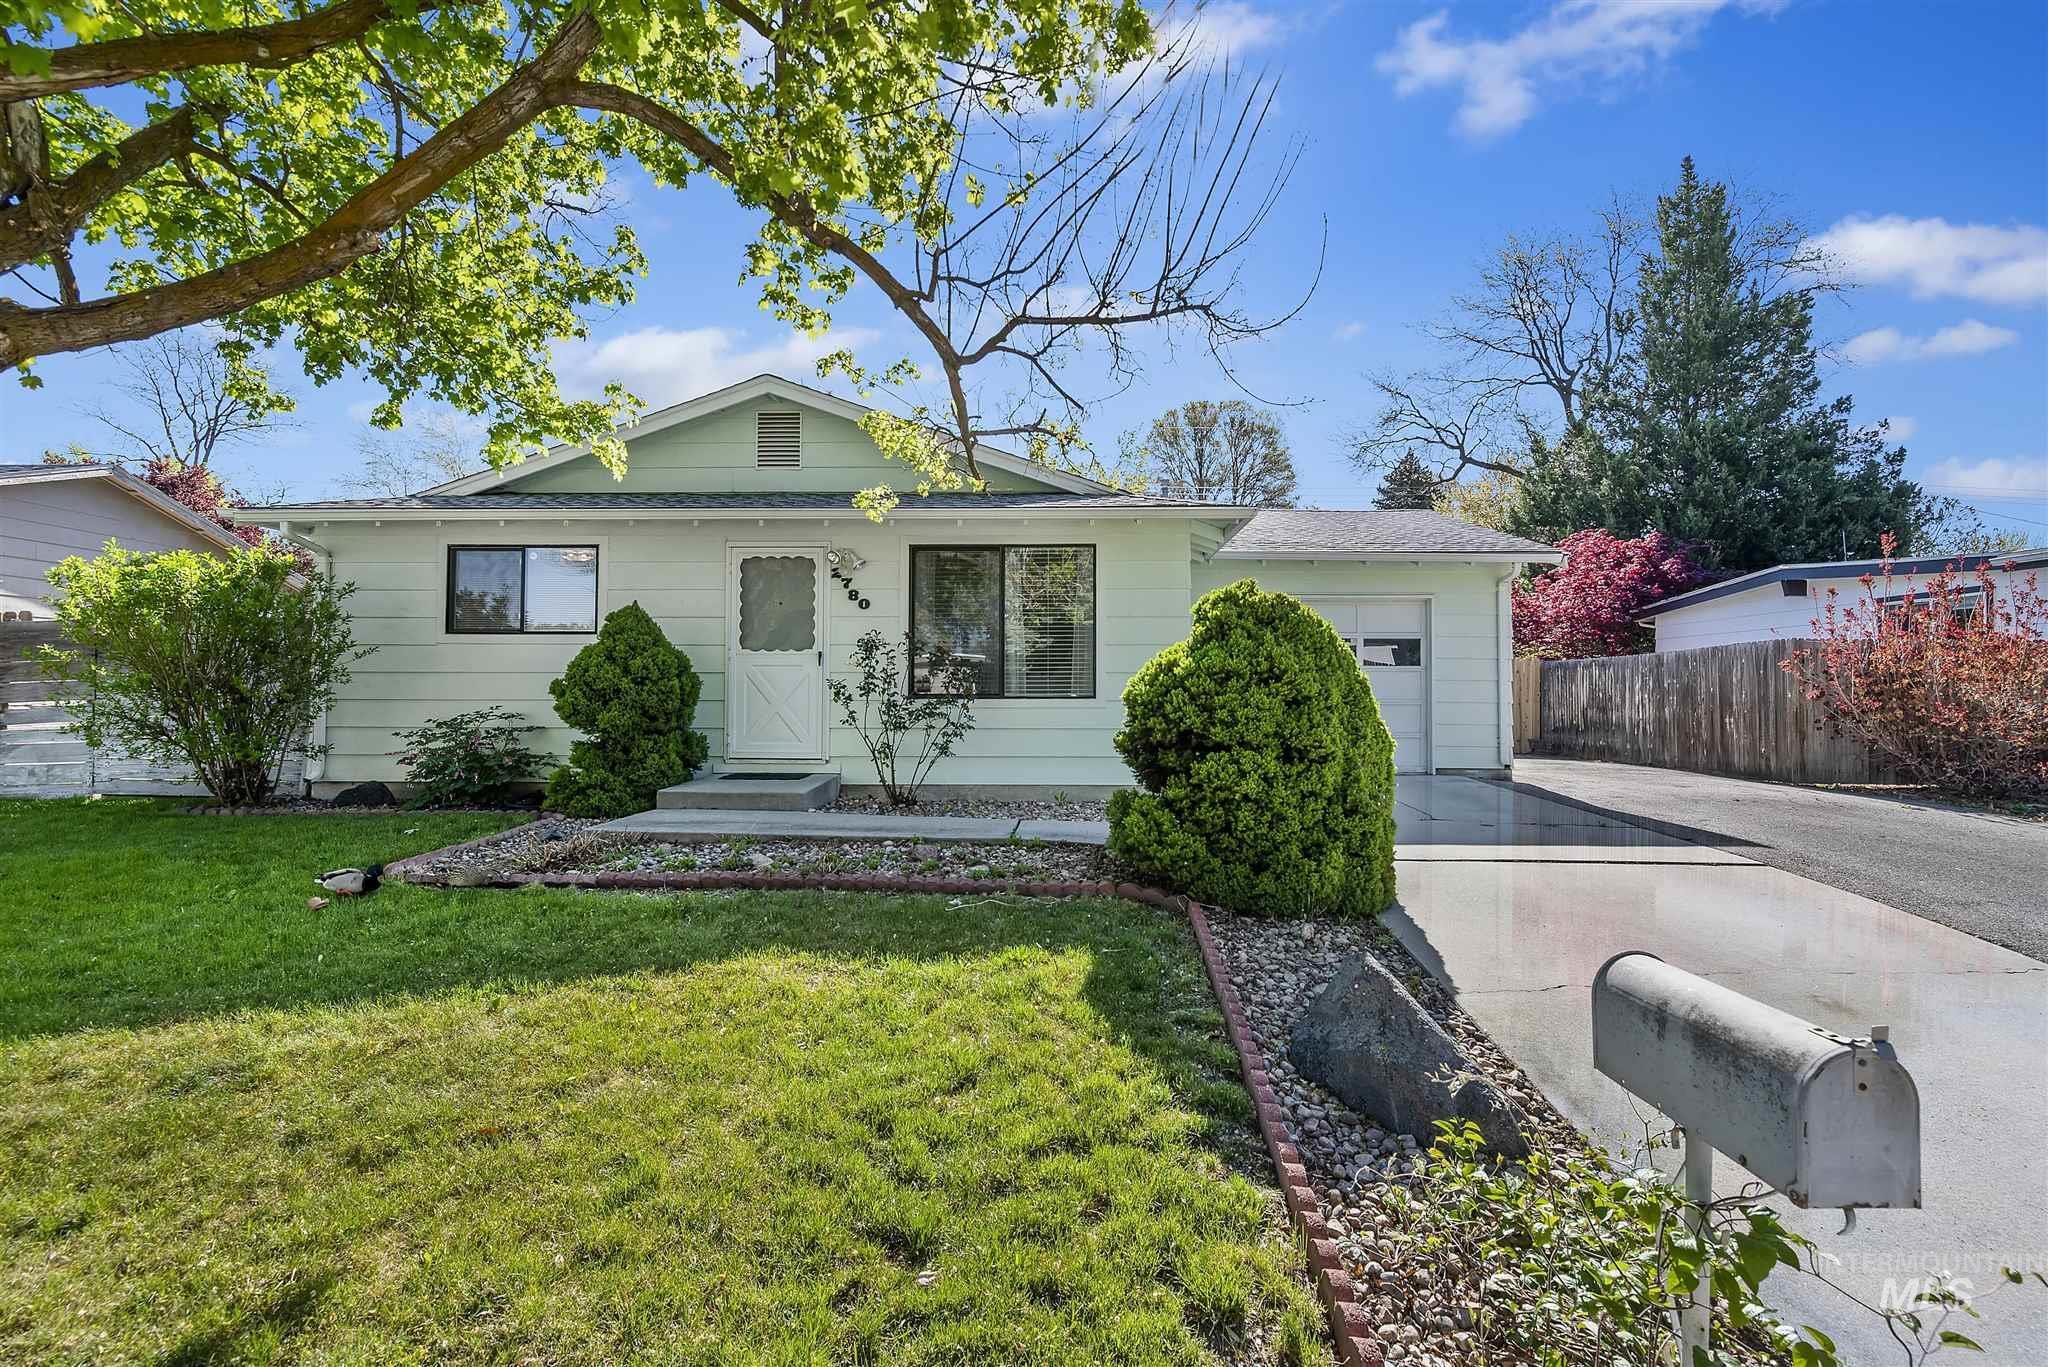 2780 N 38th St Property Photo 1